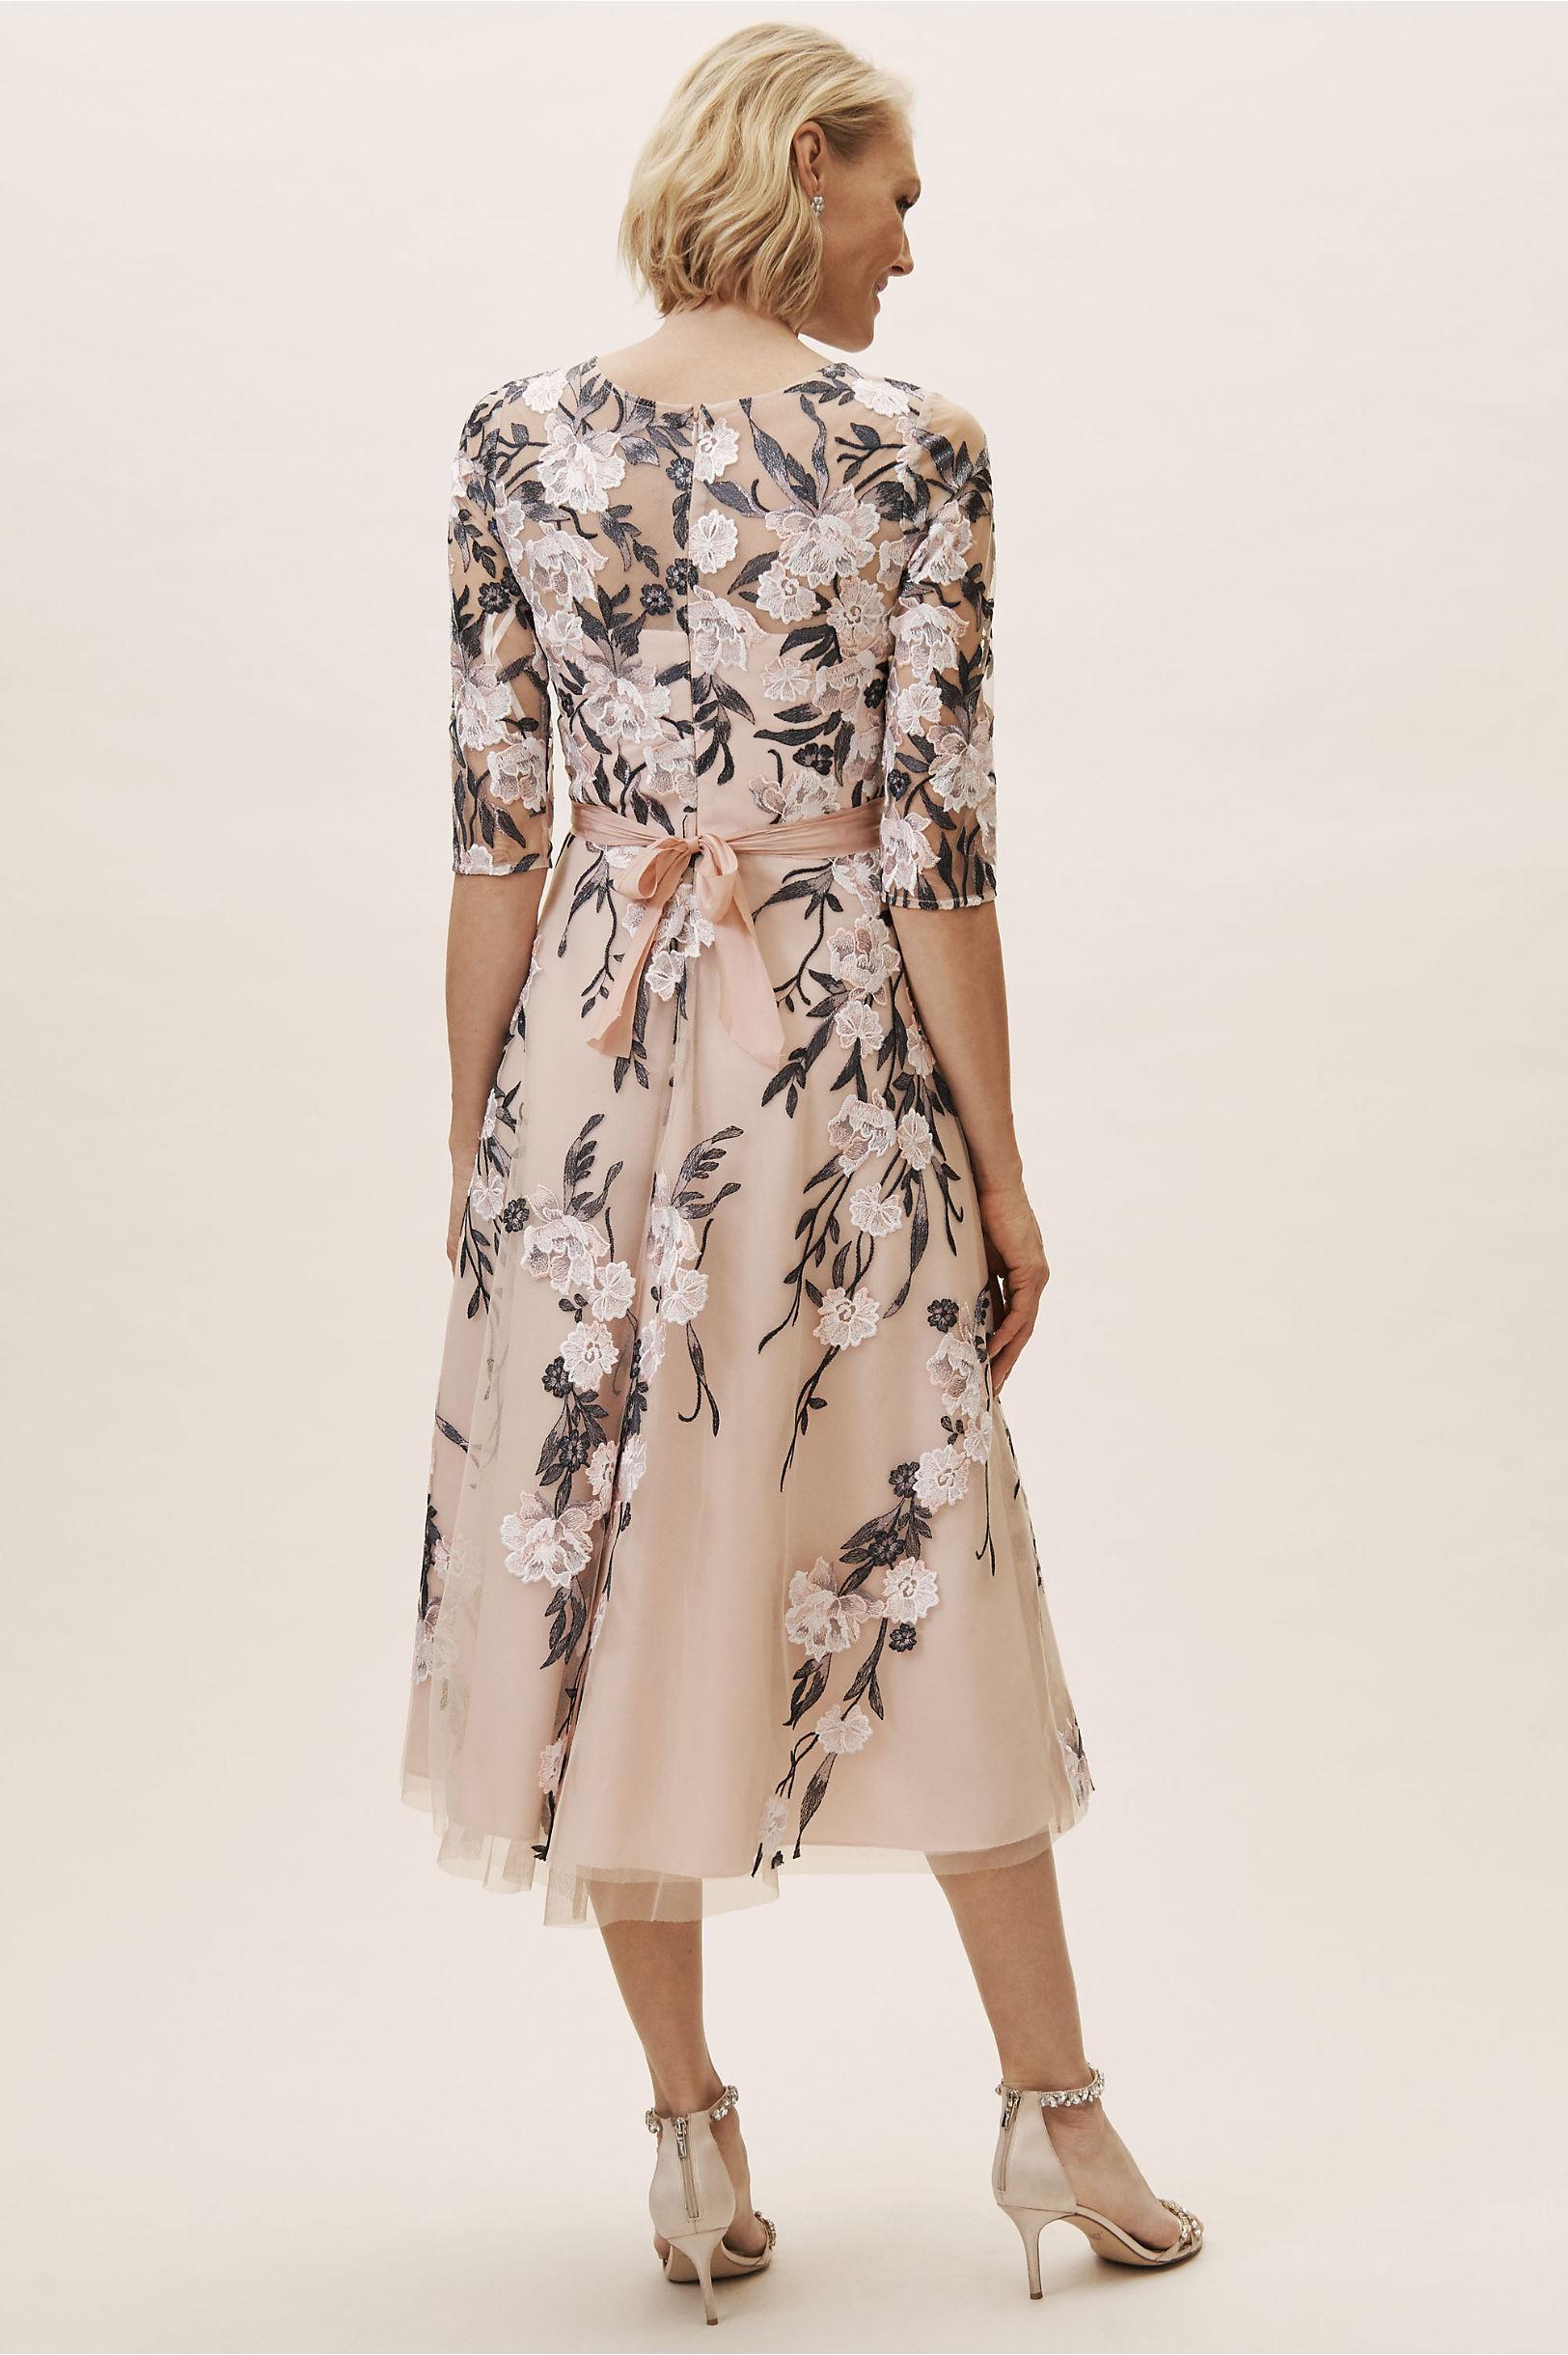 Linden Dress Blushnavy Multi In Bridesmaids Bridal Party Bhldn